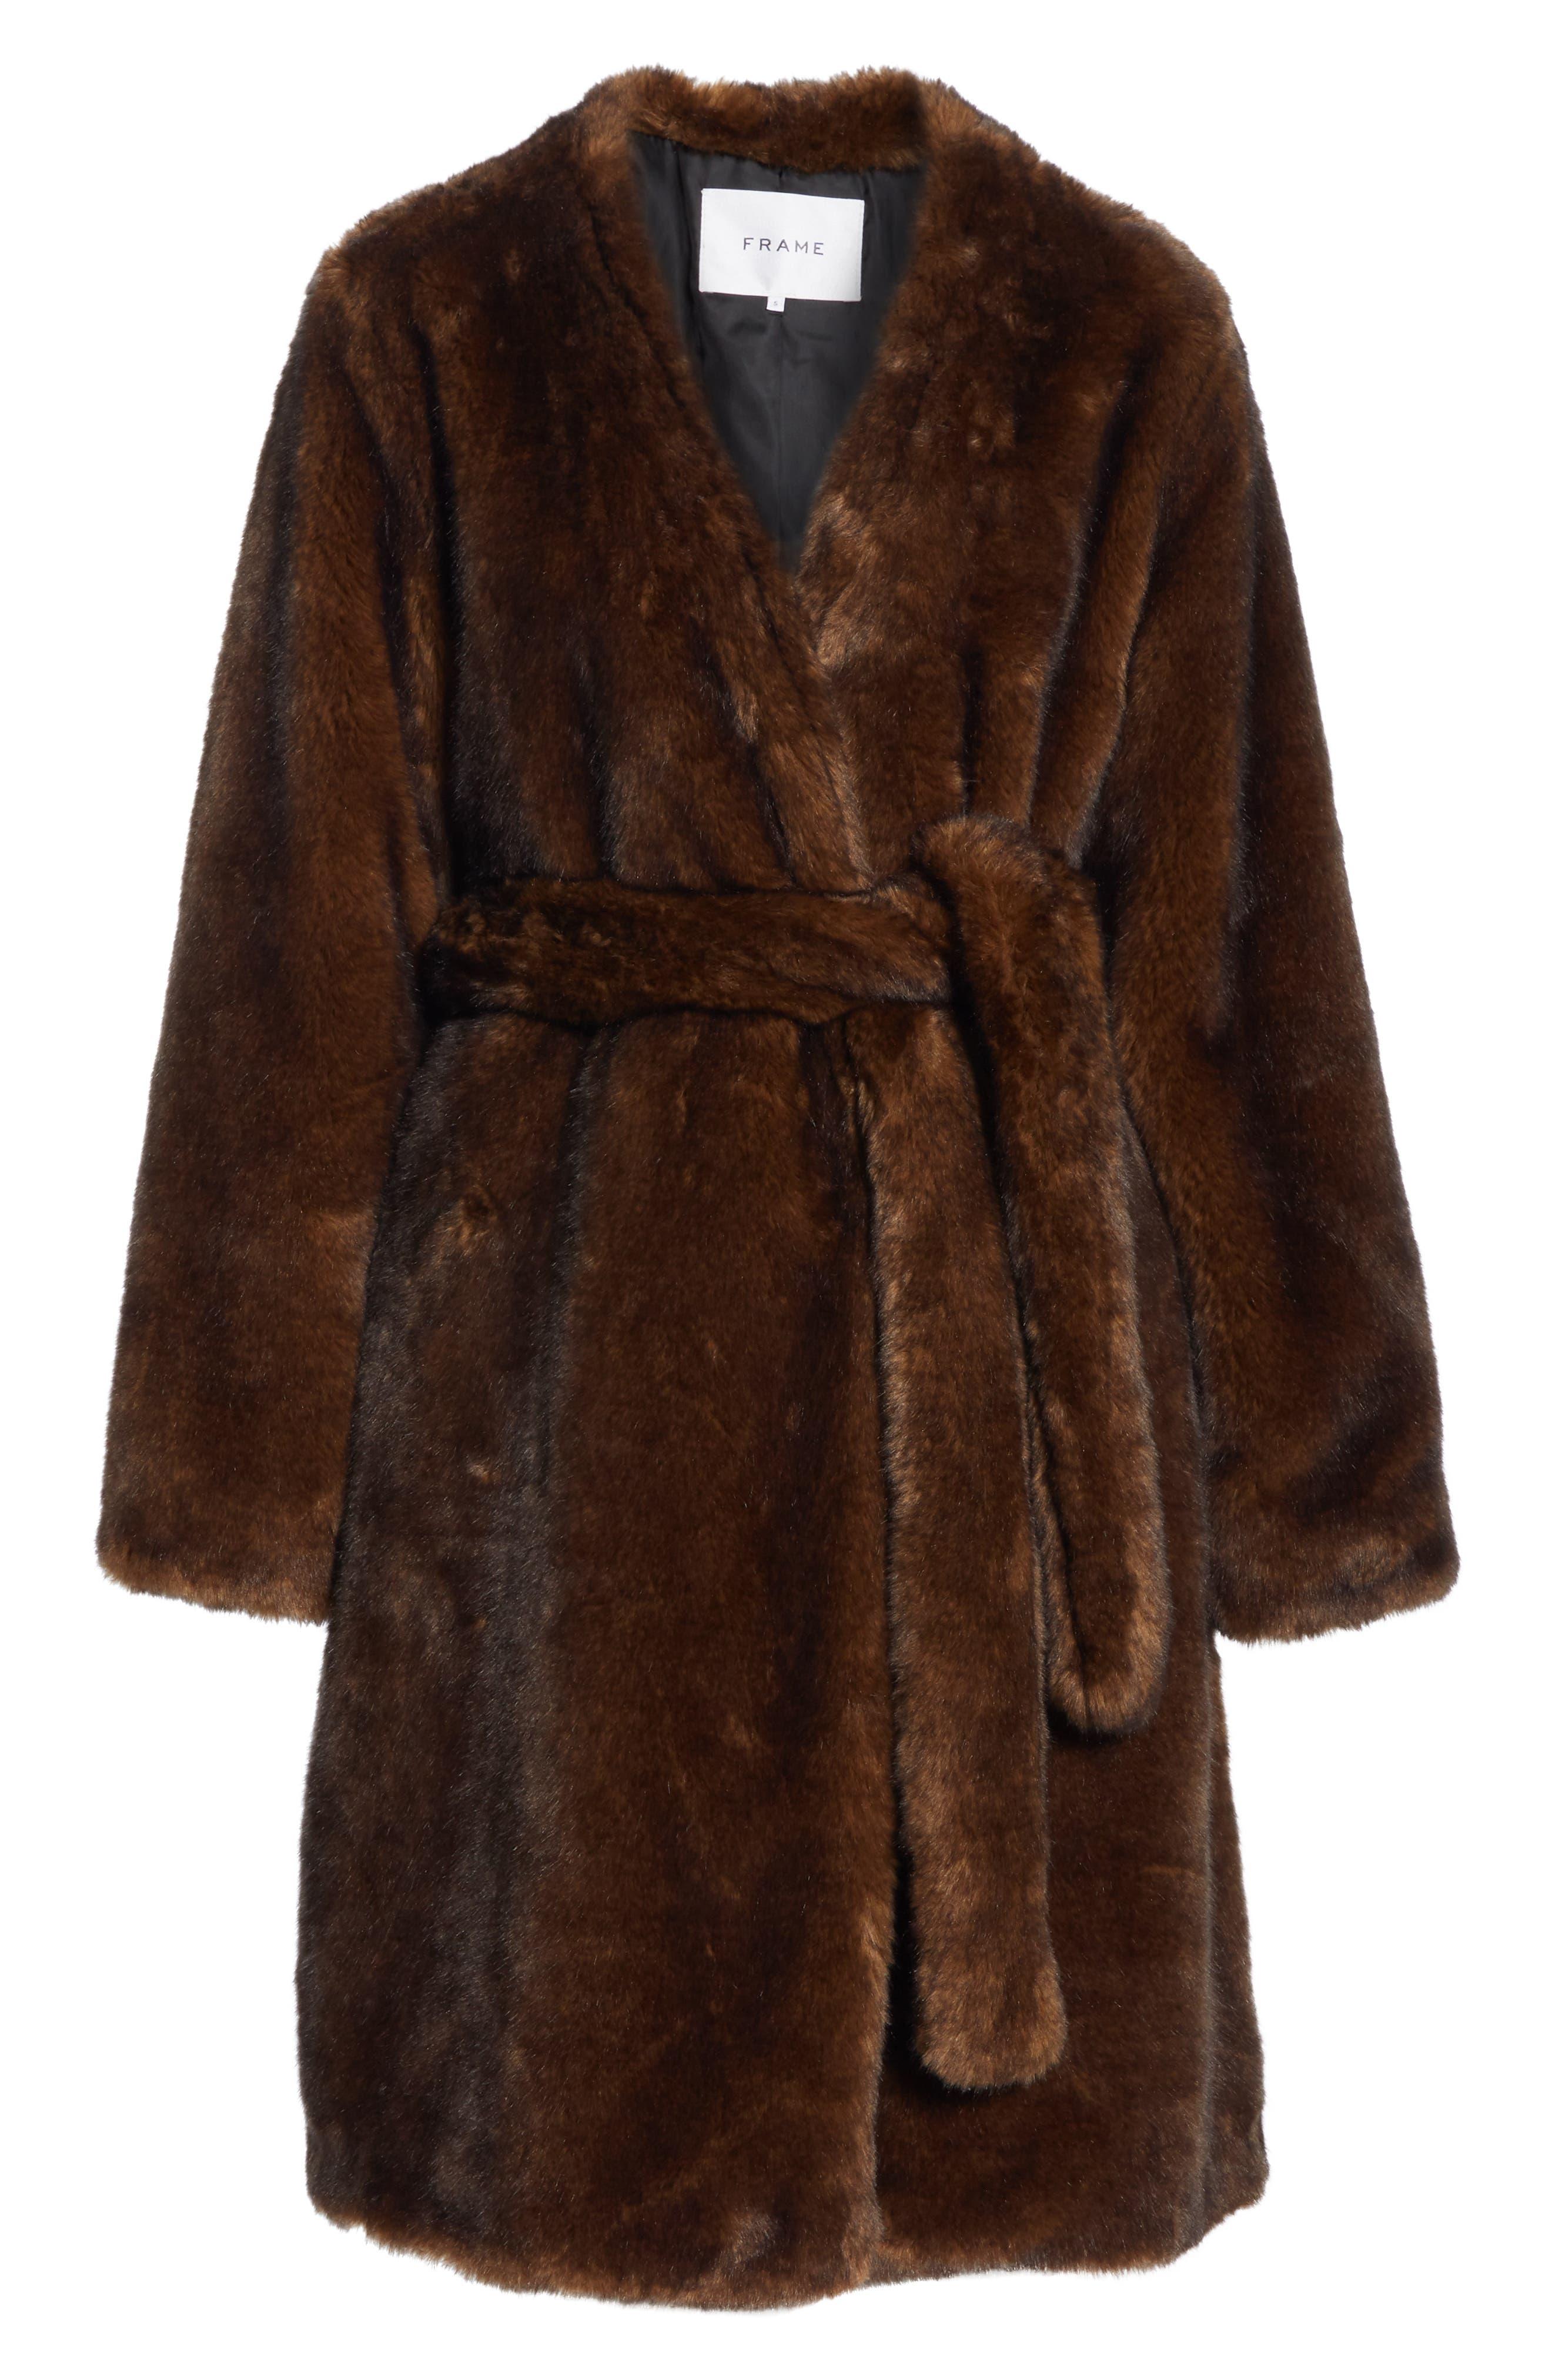 FRAME,                             Faux Mink Fur Robe Coat,                             Alternate thumbnail 6, color,                             201